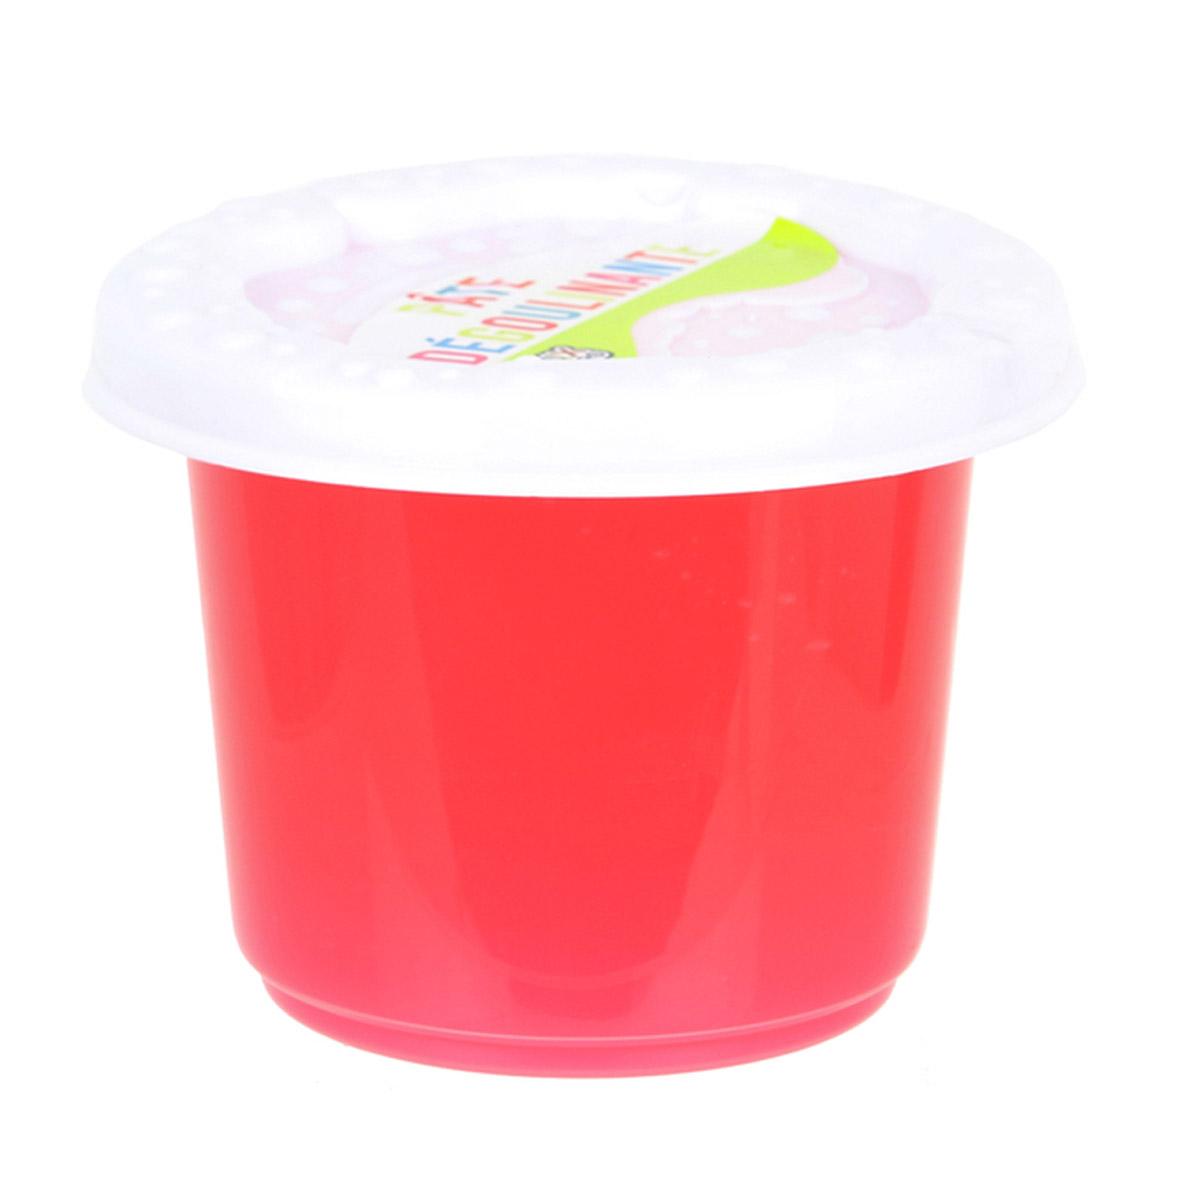 Pate gluante et dégoulinante \'Slime\' rose - 500g - [R2373]